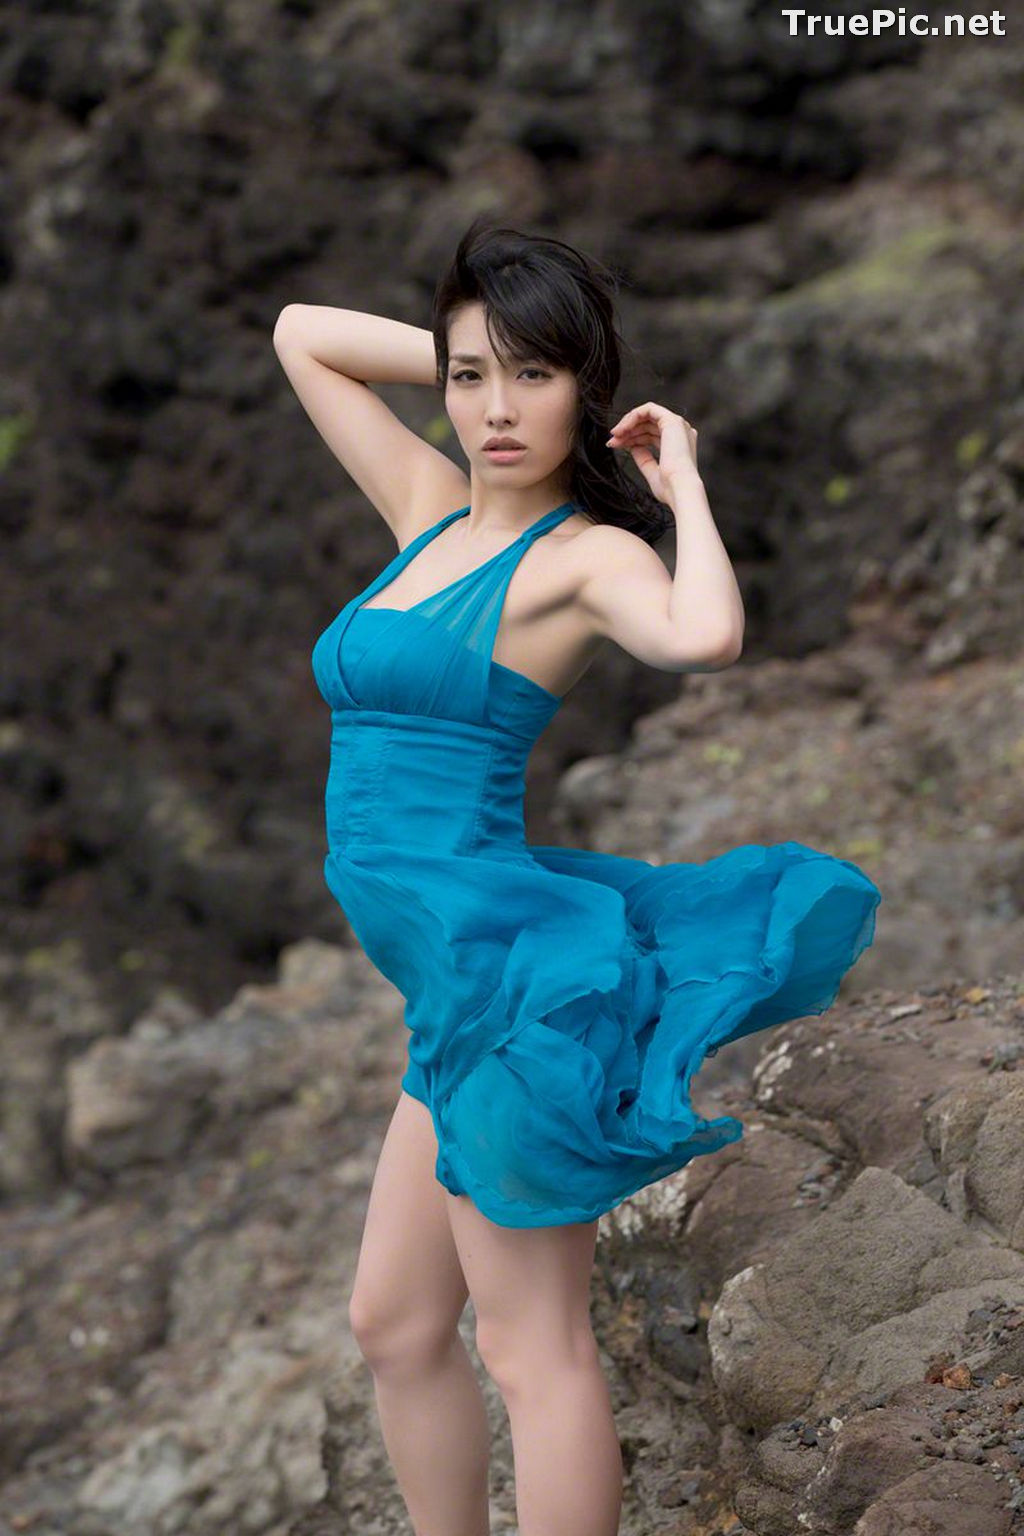 Image Wanibooks No.127 - Japanese Gravure Idol and Actress - Anna Konno - TruePic.net - Picture-7